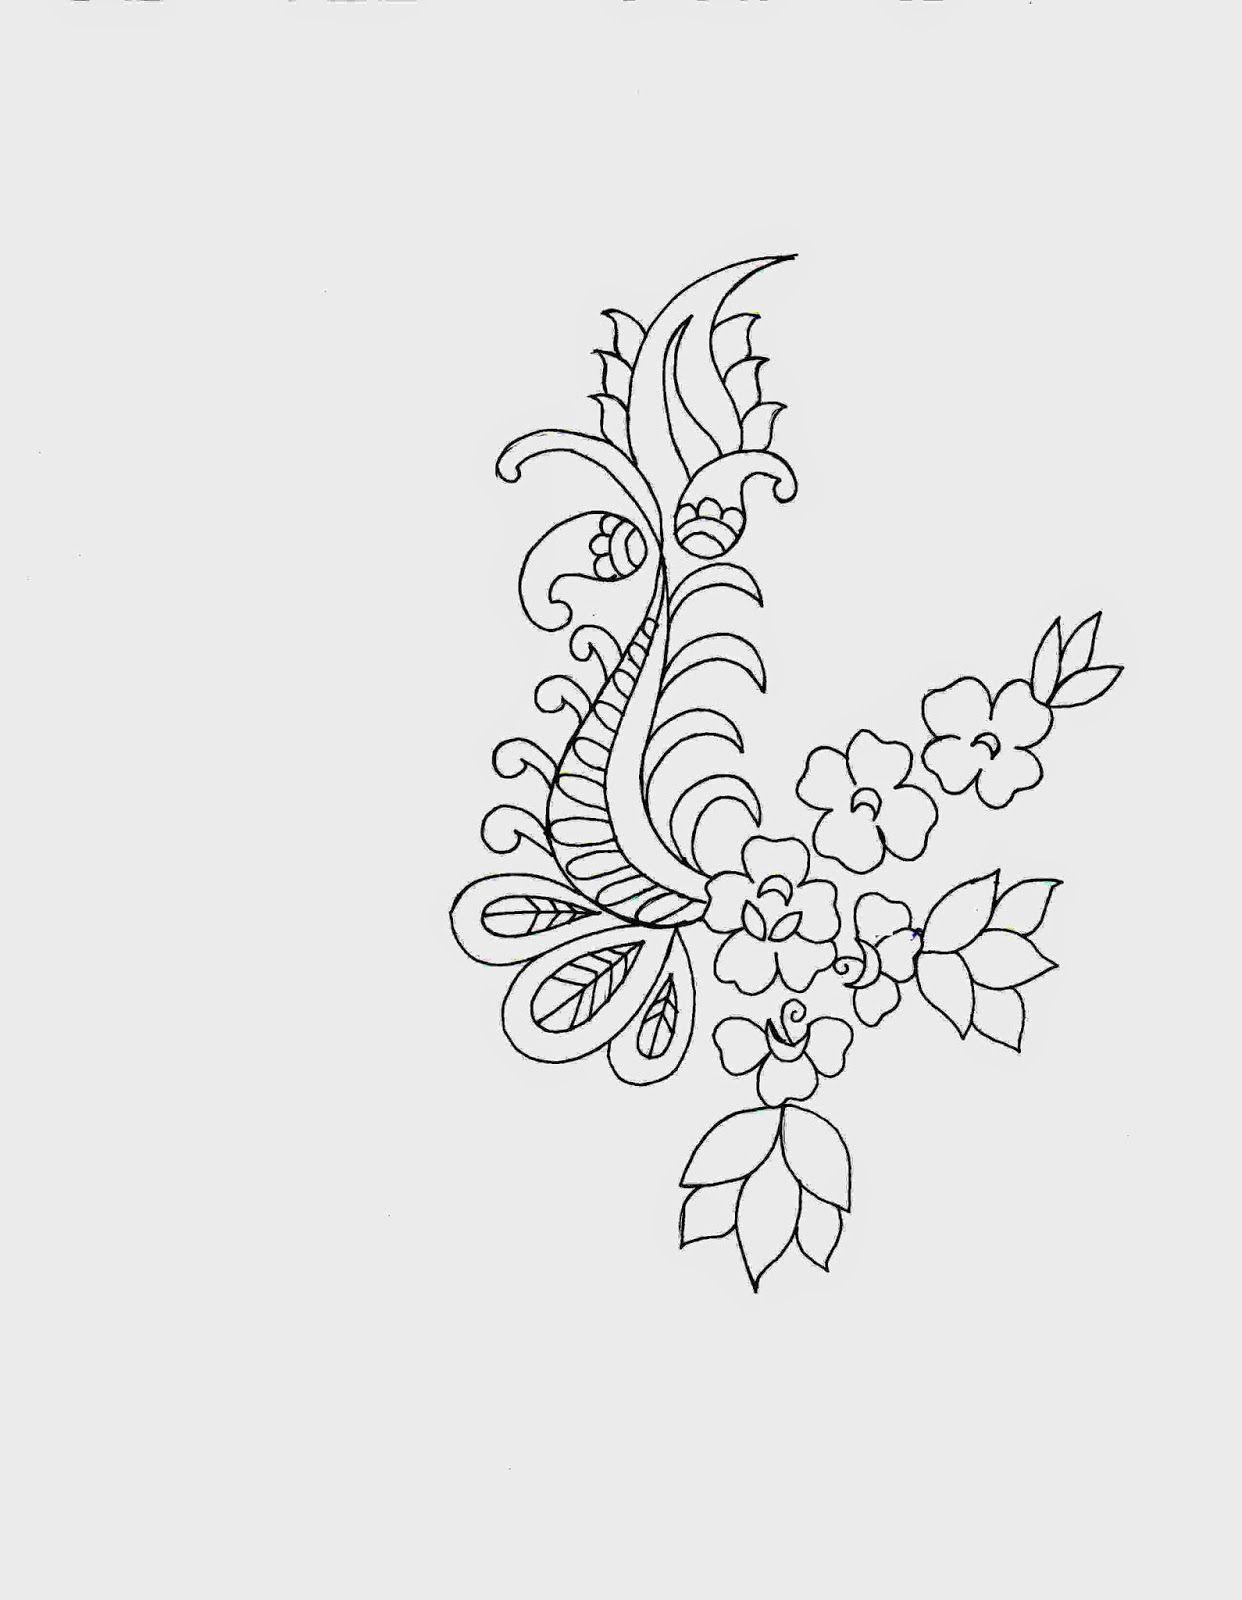 Kleurvolle Applique Skets Ontwerp | Embroidery Designs | Pinterest | Sketch Design Embroidery ...